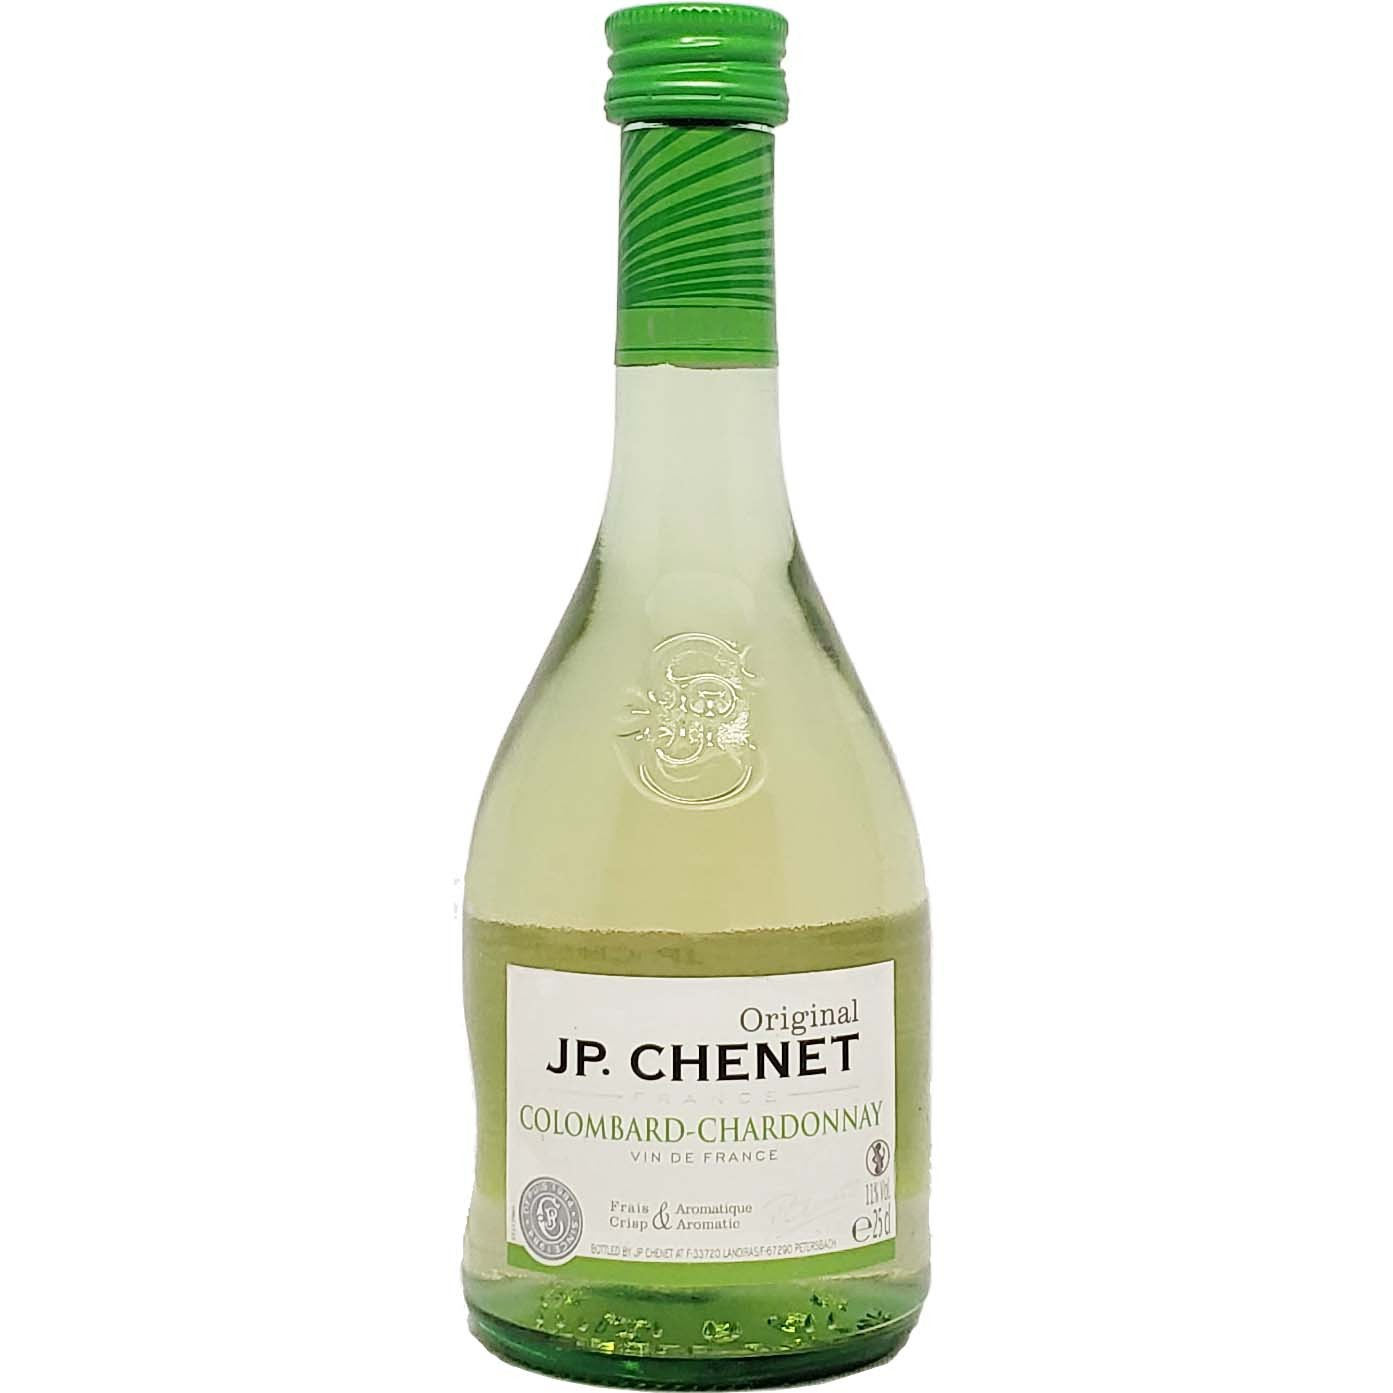 Vinho Branco JP. Chenet Colombard-Chardonnay - 250ml -